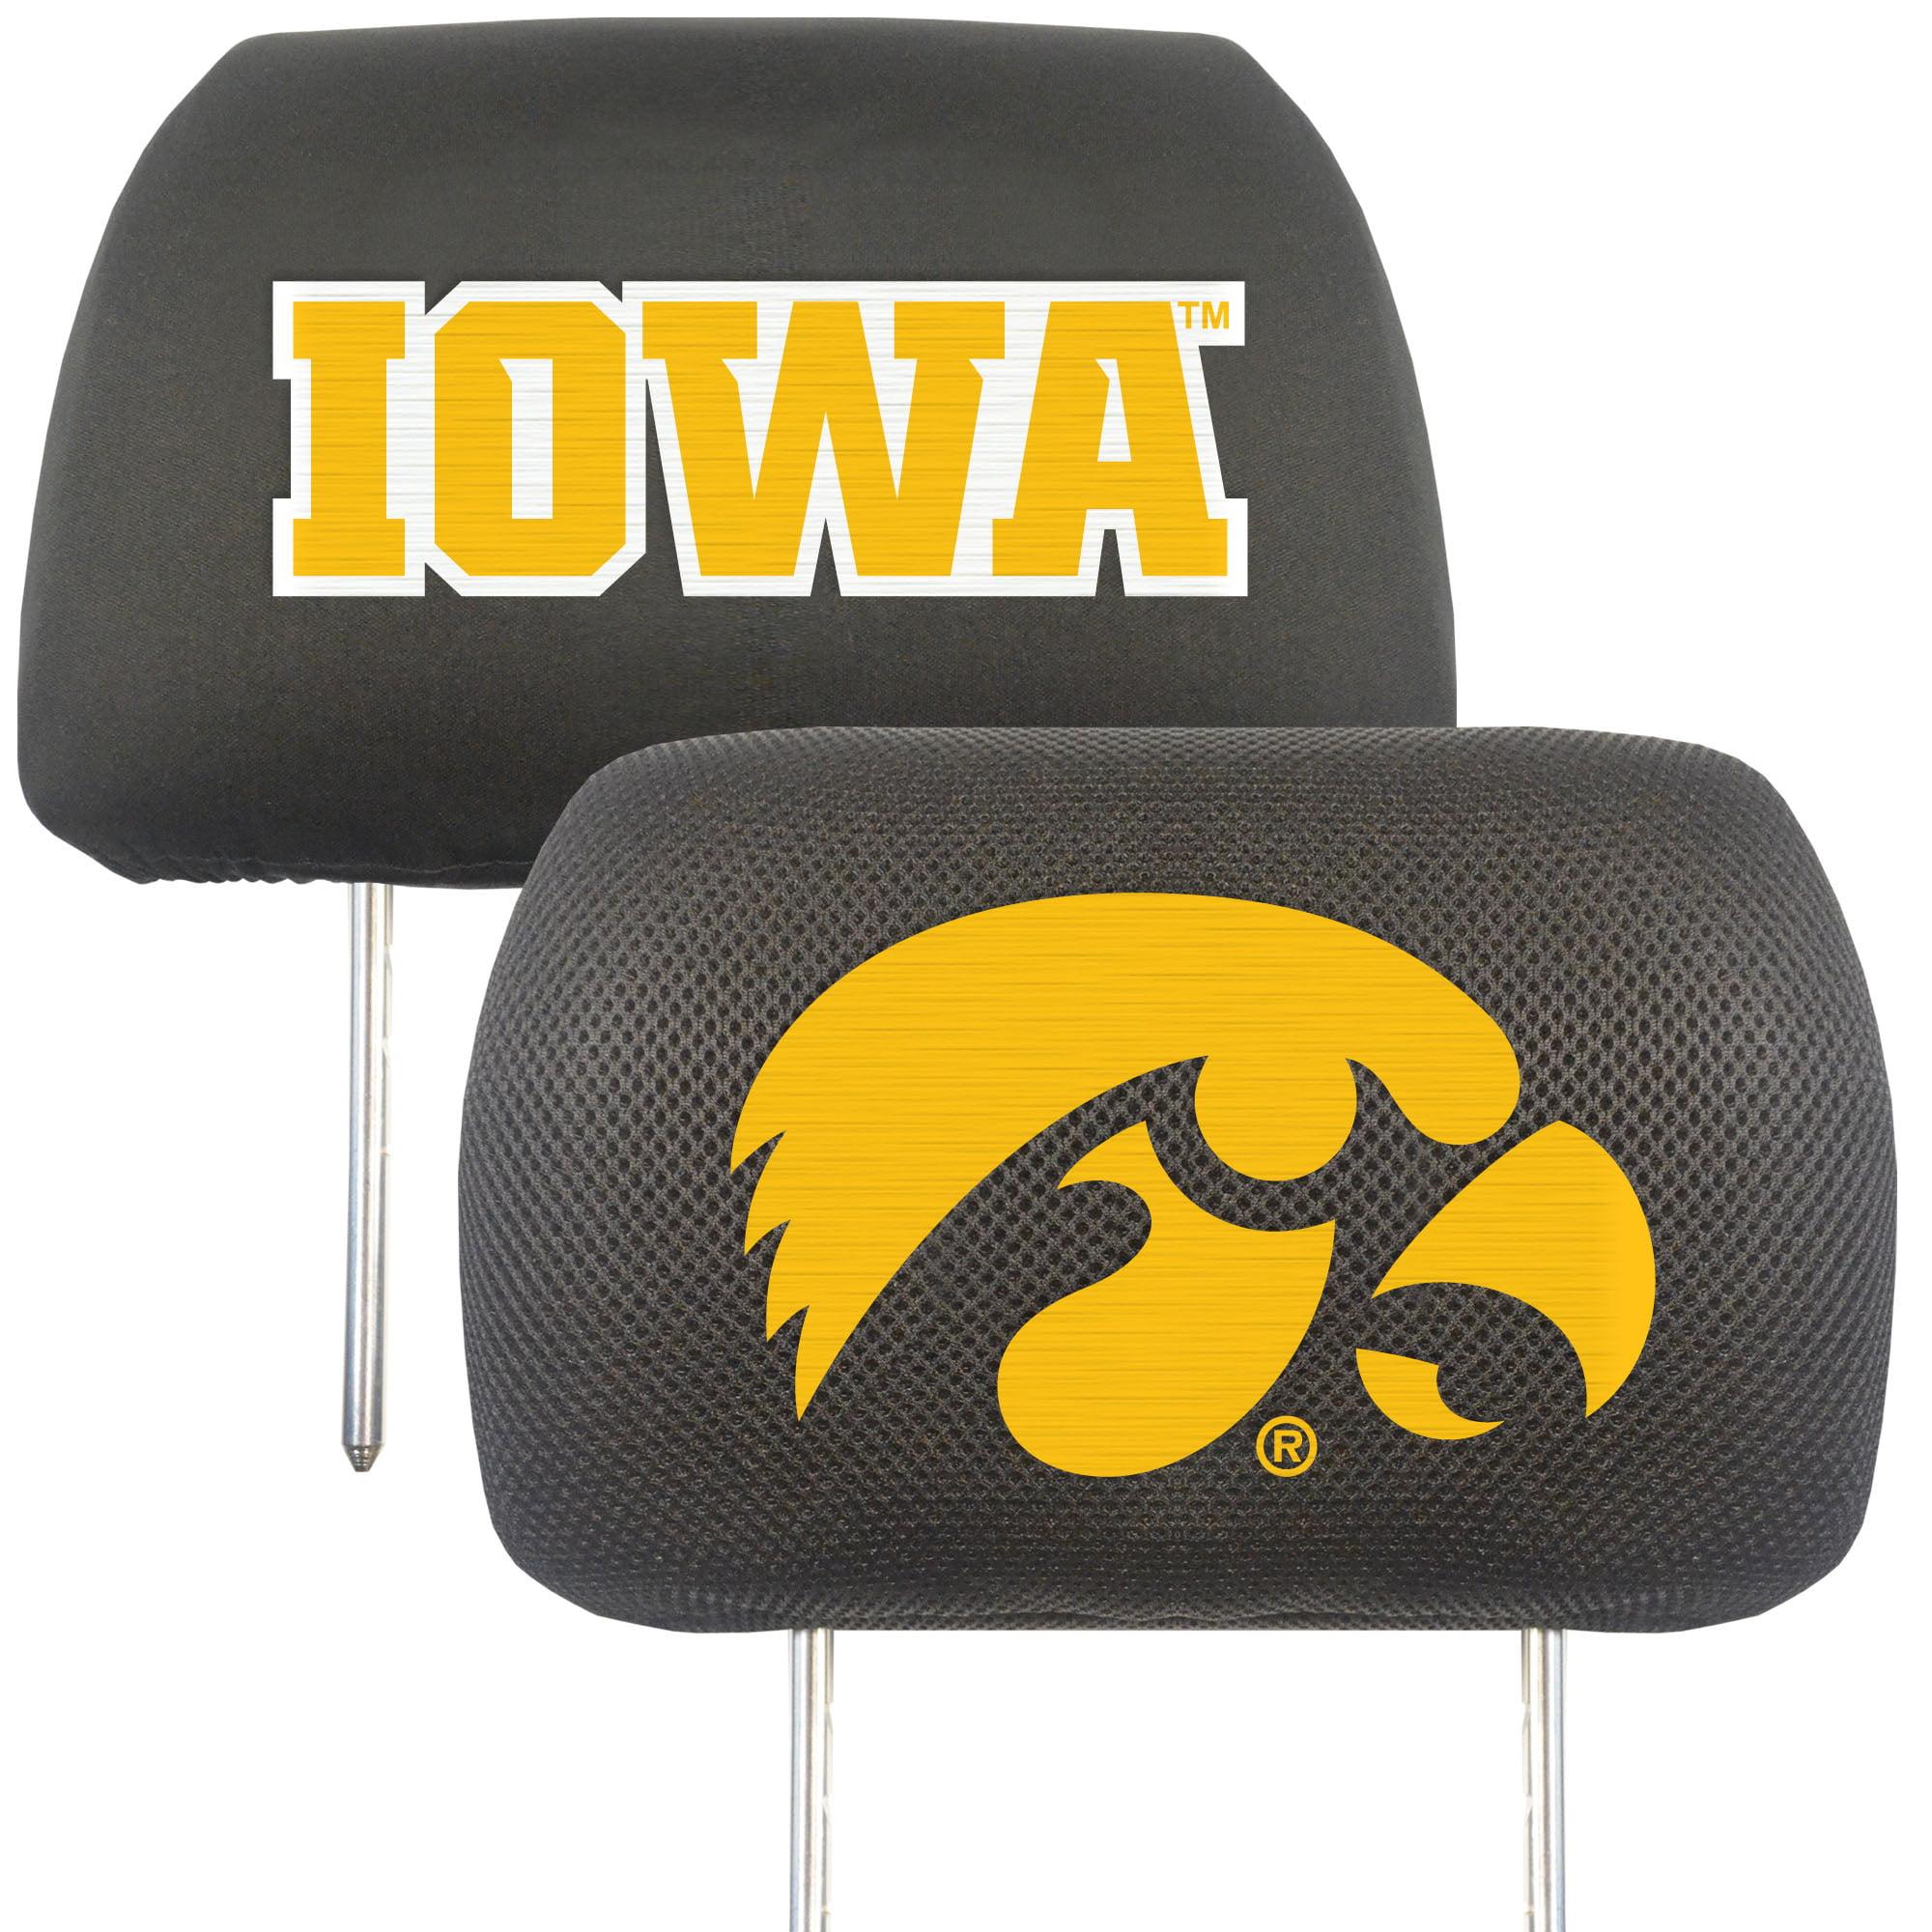 NCAA University of Iowa Hawkeyes Head Rest Cover Automotive Accessory